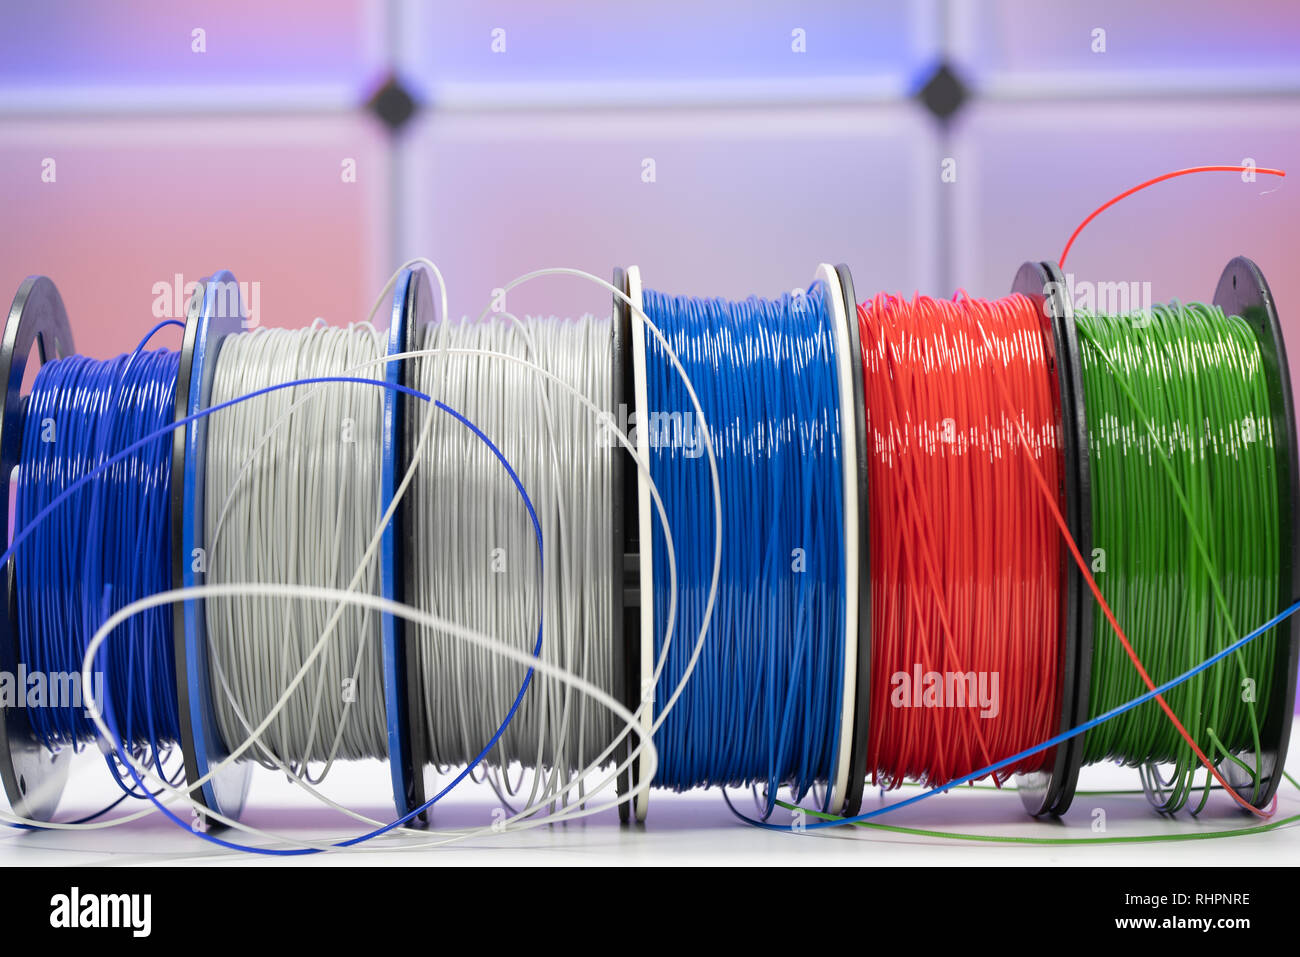 Spools of plastic filaments for 3D Printer - Stock Image